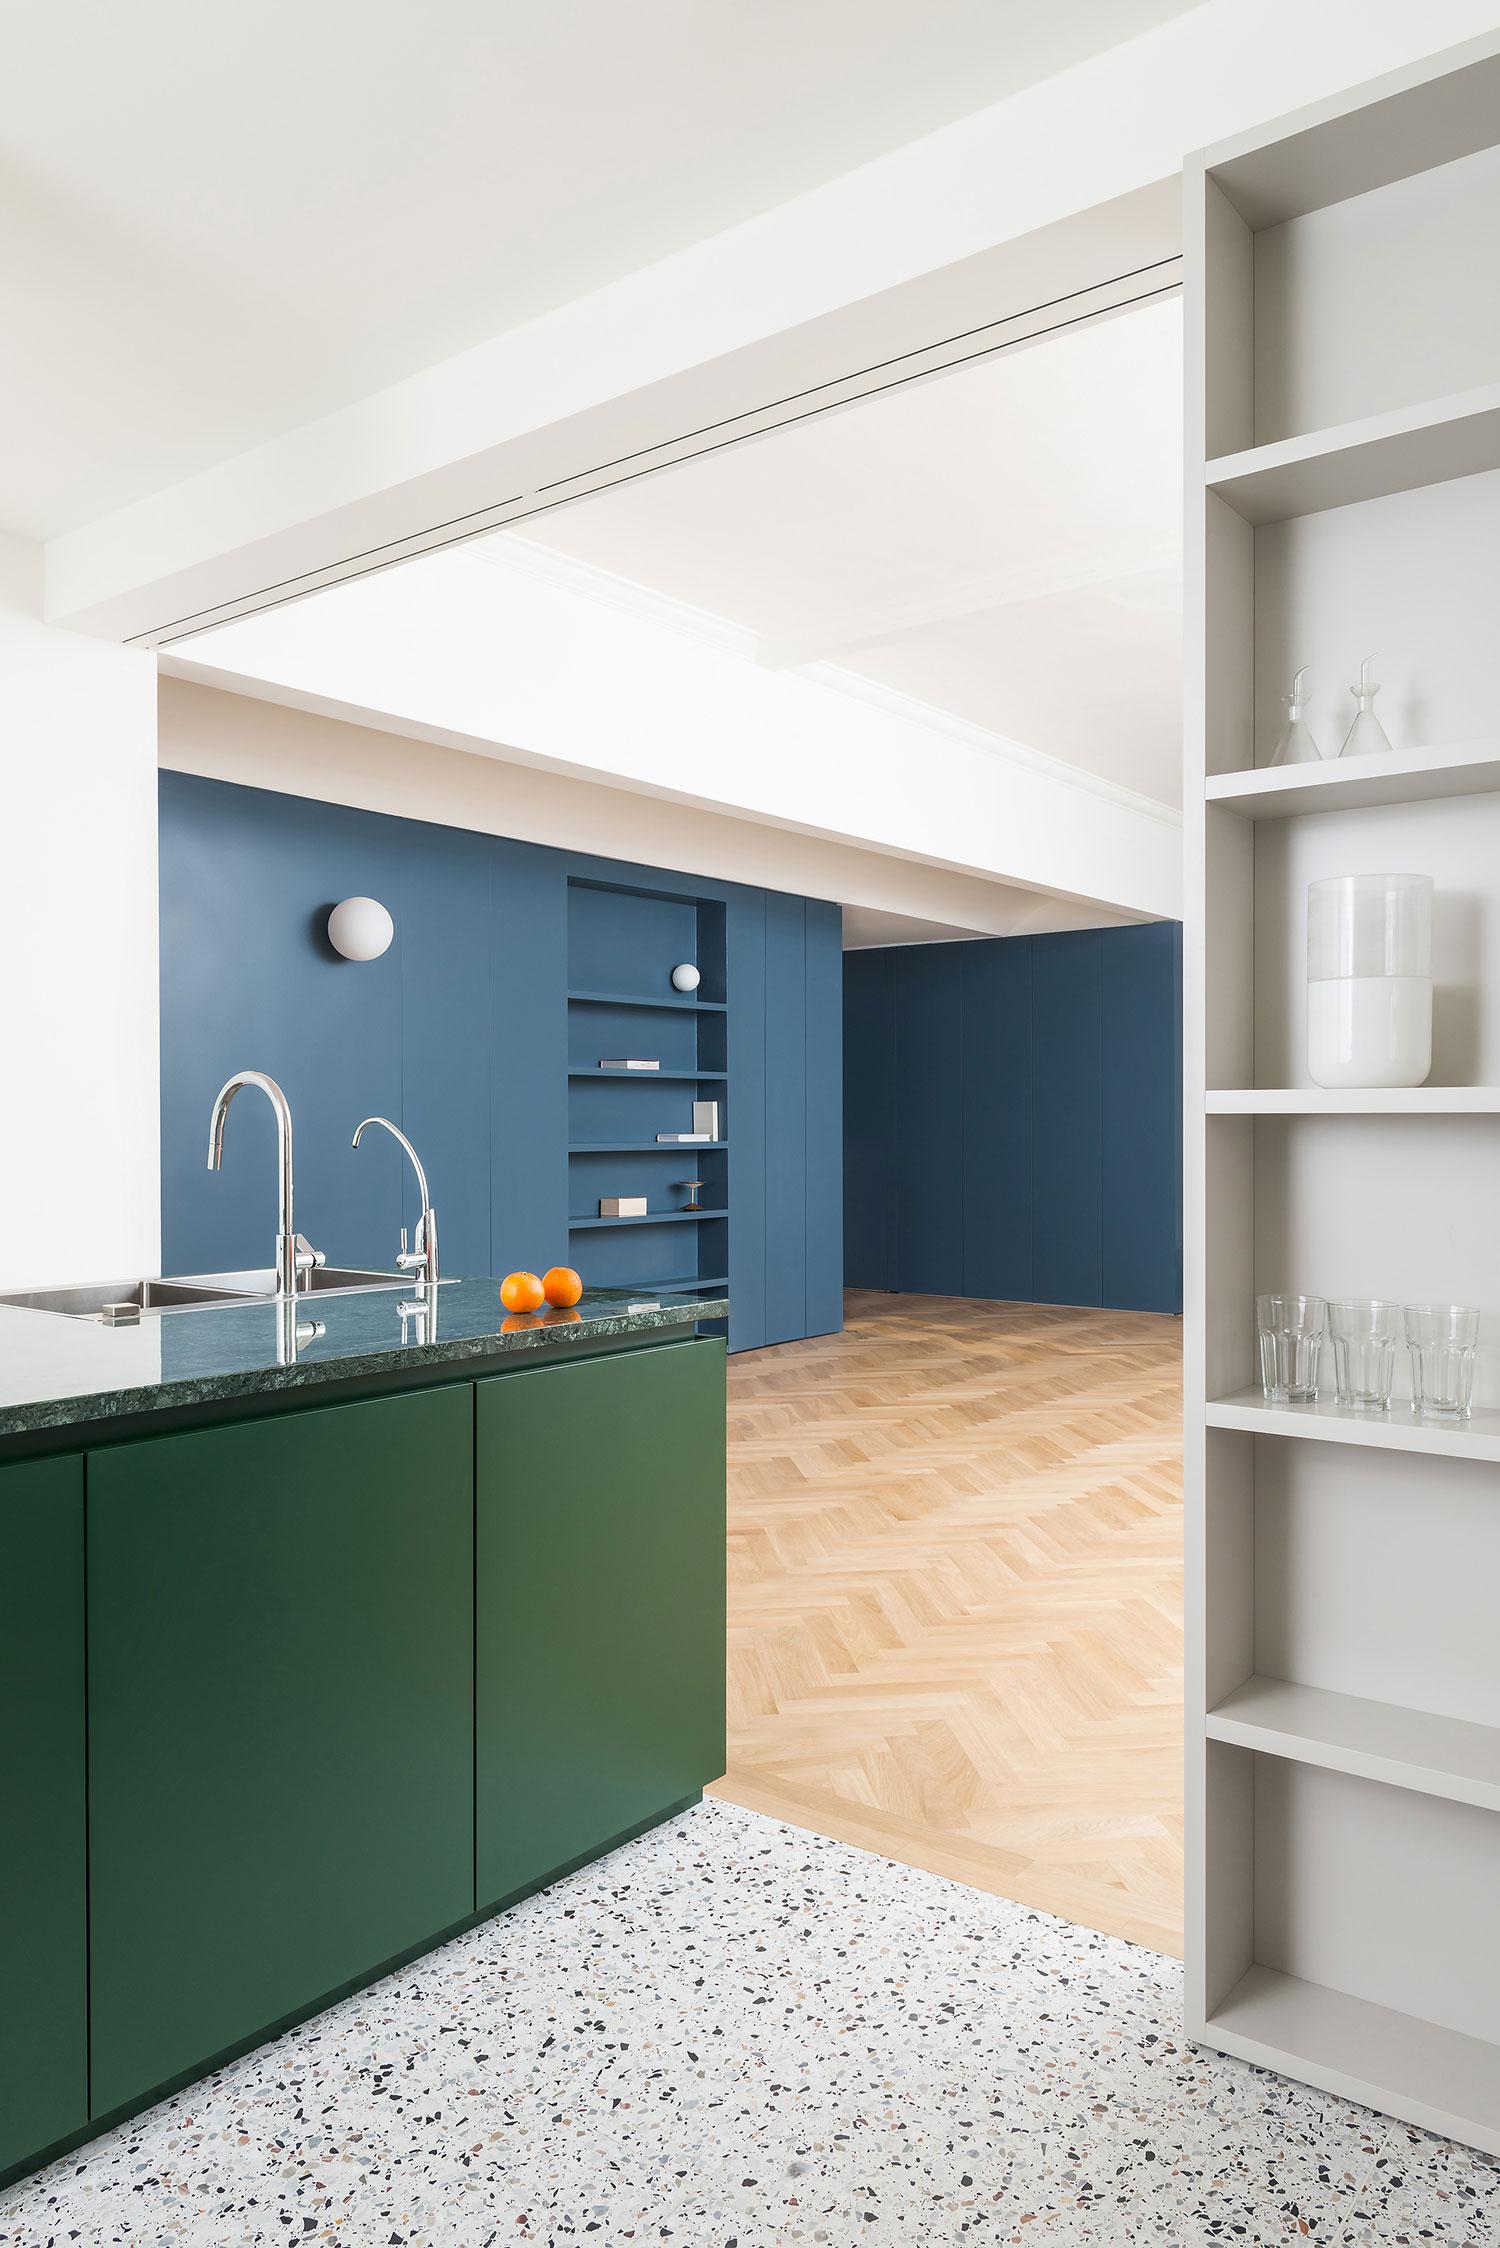 White and grey terrazzo kitchen floor